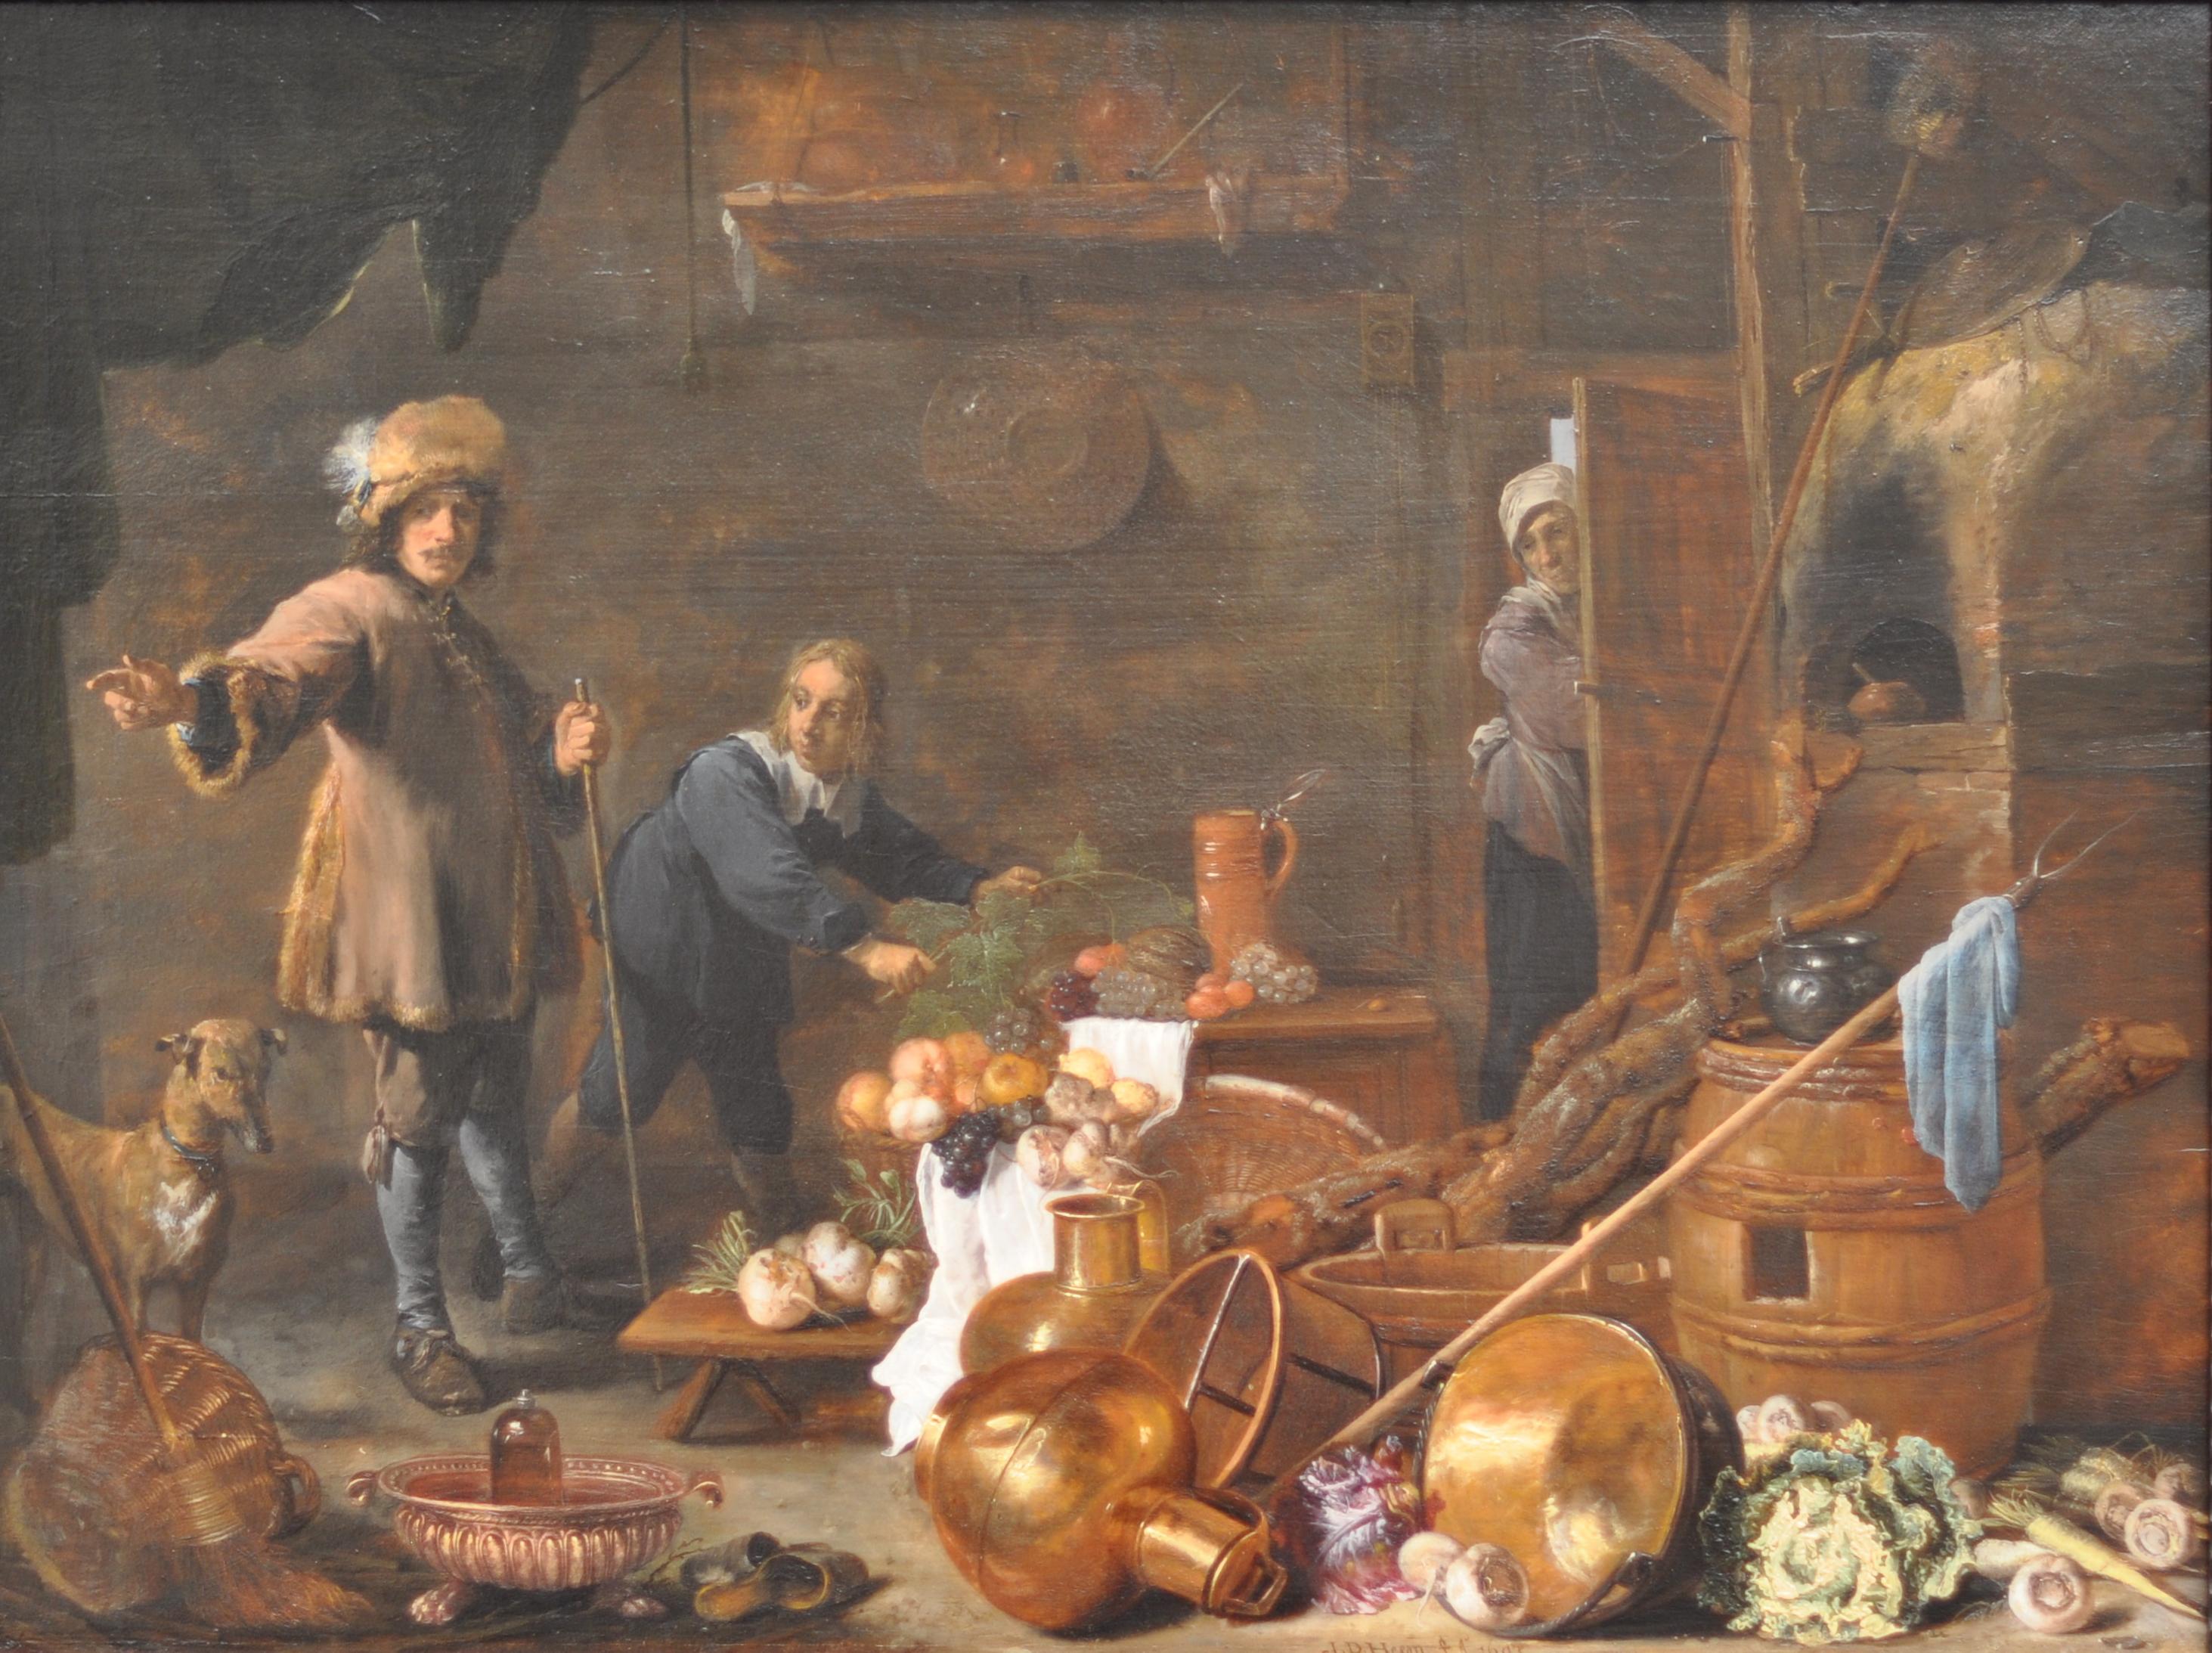 File:Teniers, An artist in his studio.JPG